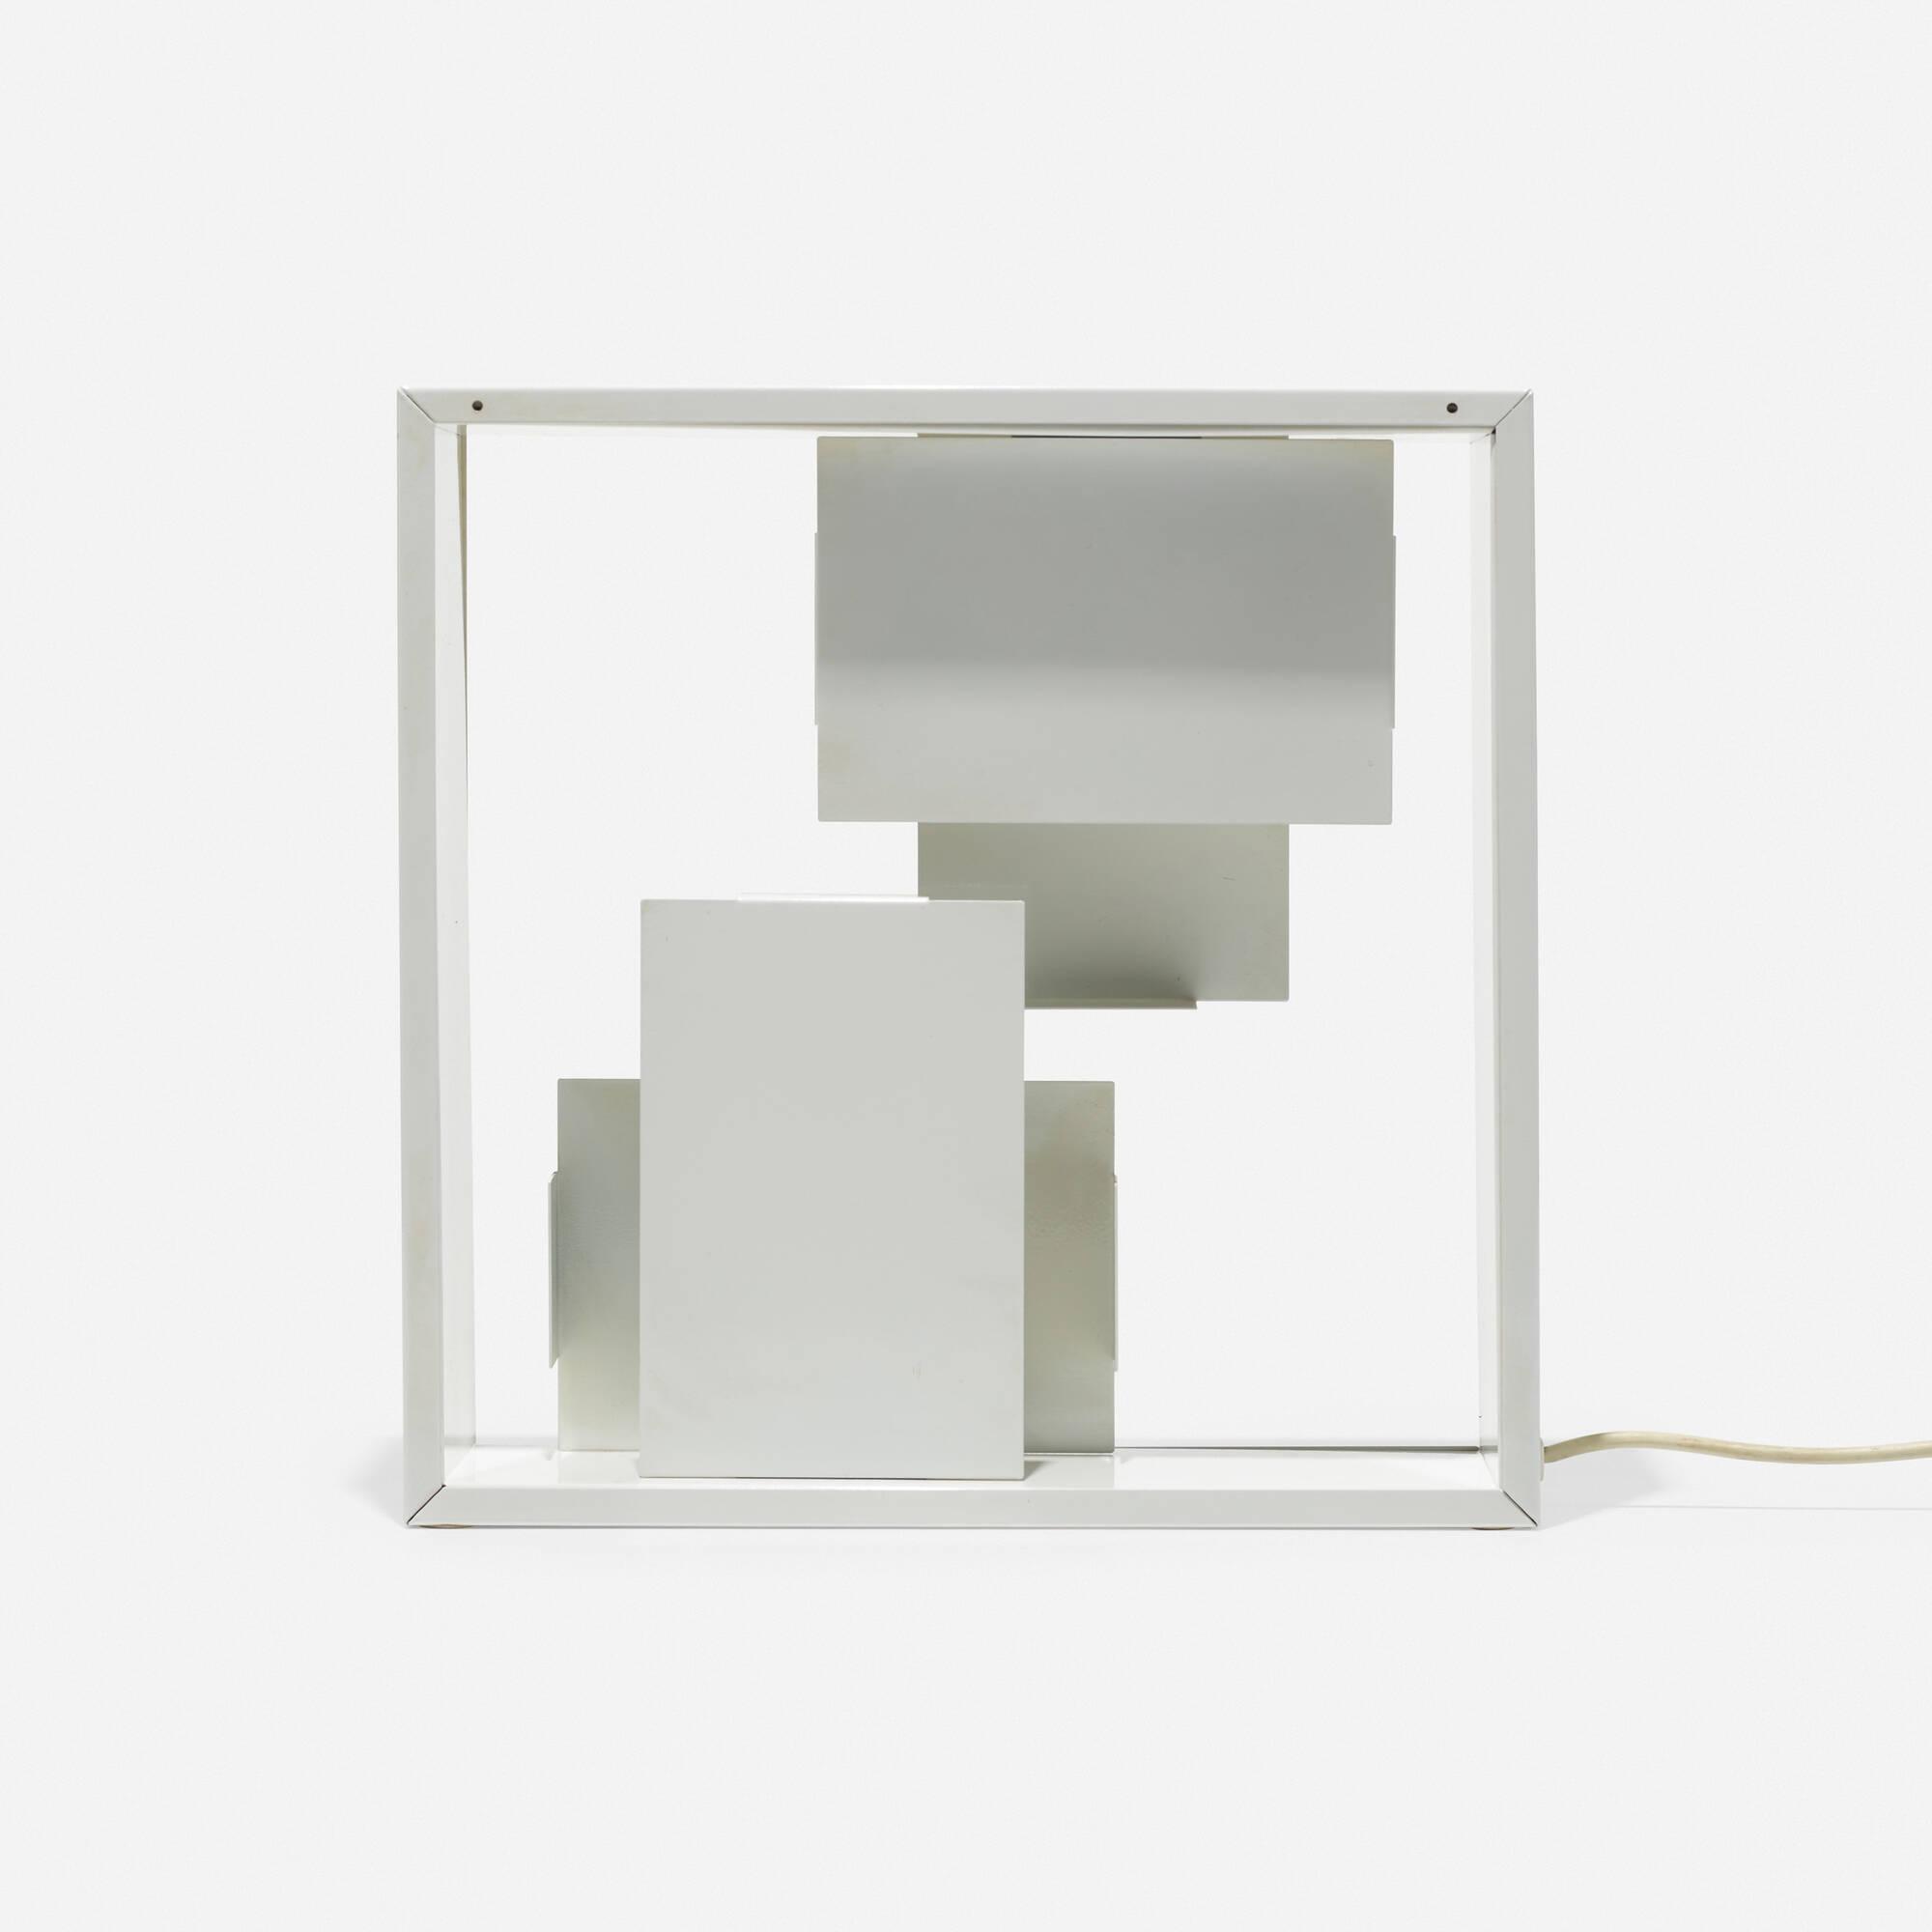 477: Gio Ponti / Fato table lamp (2 of 3)